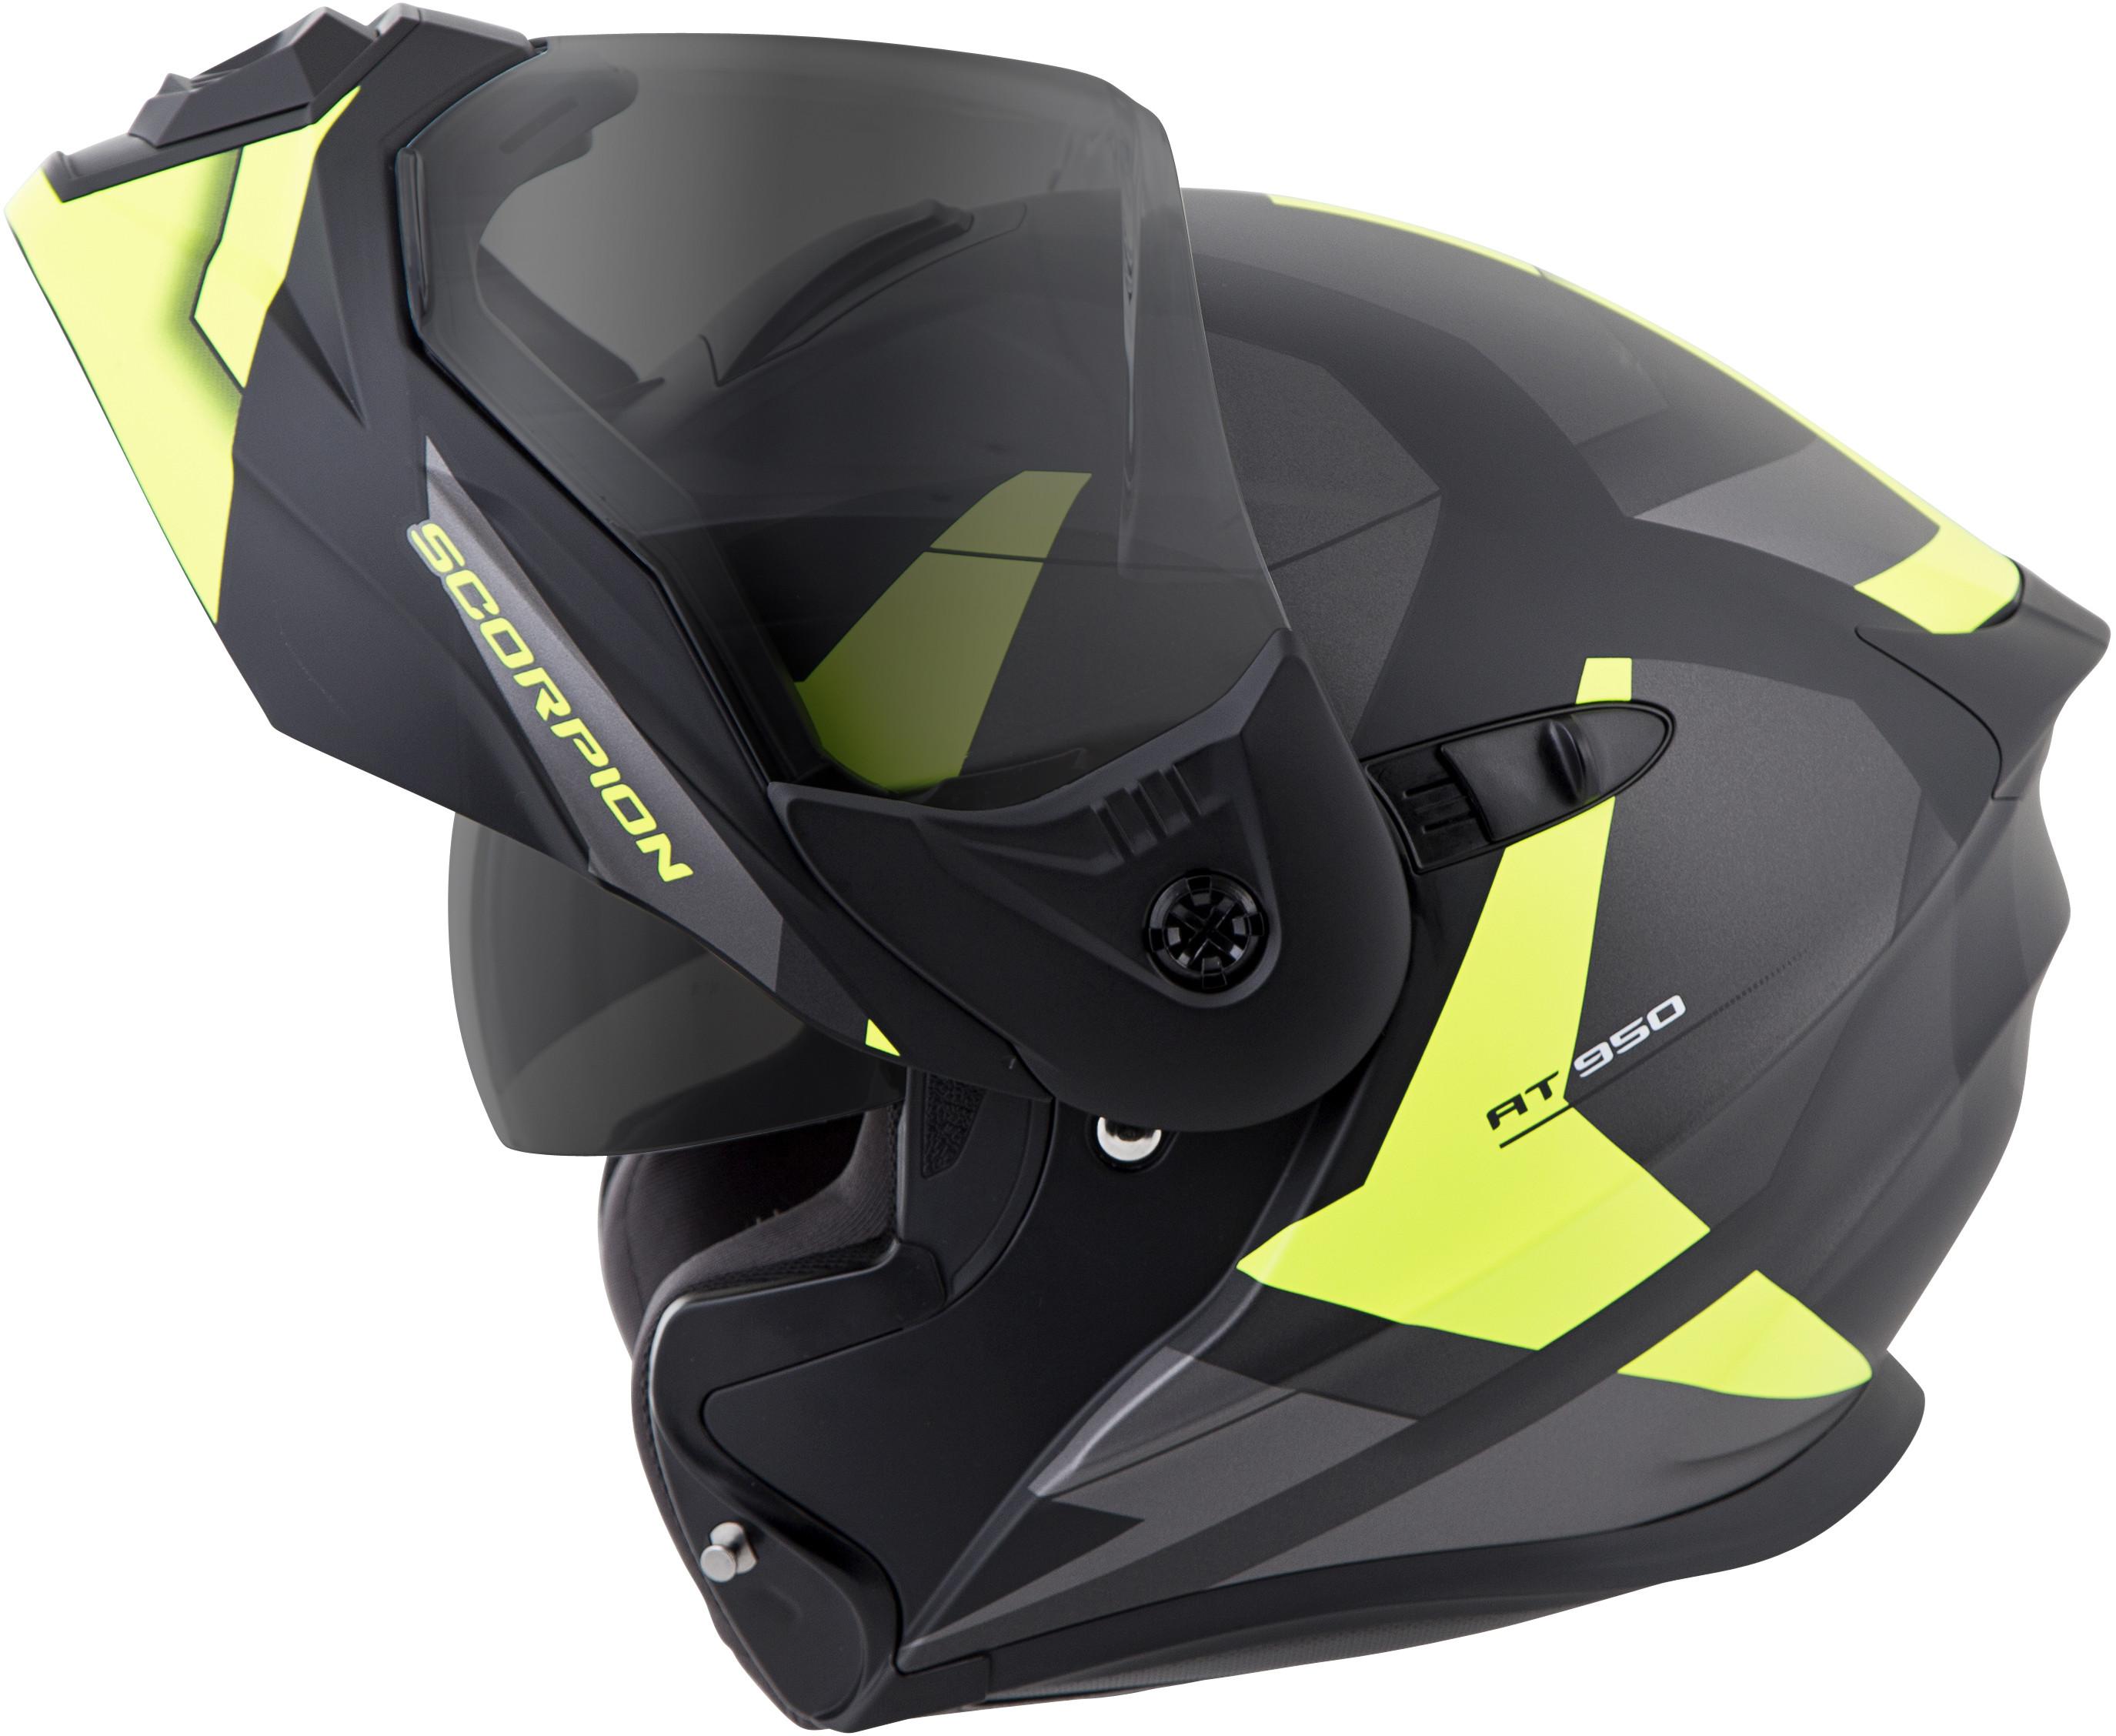 for-Scorpion-Helmet-EXO-AT950-Neocon-Snow-Helmet-with-Dual-Lens-Shield miniature 39